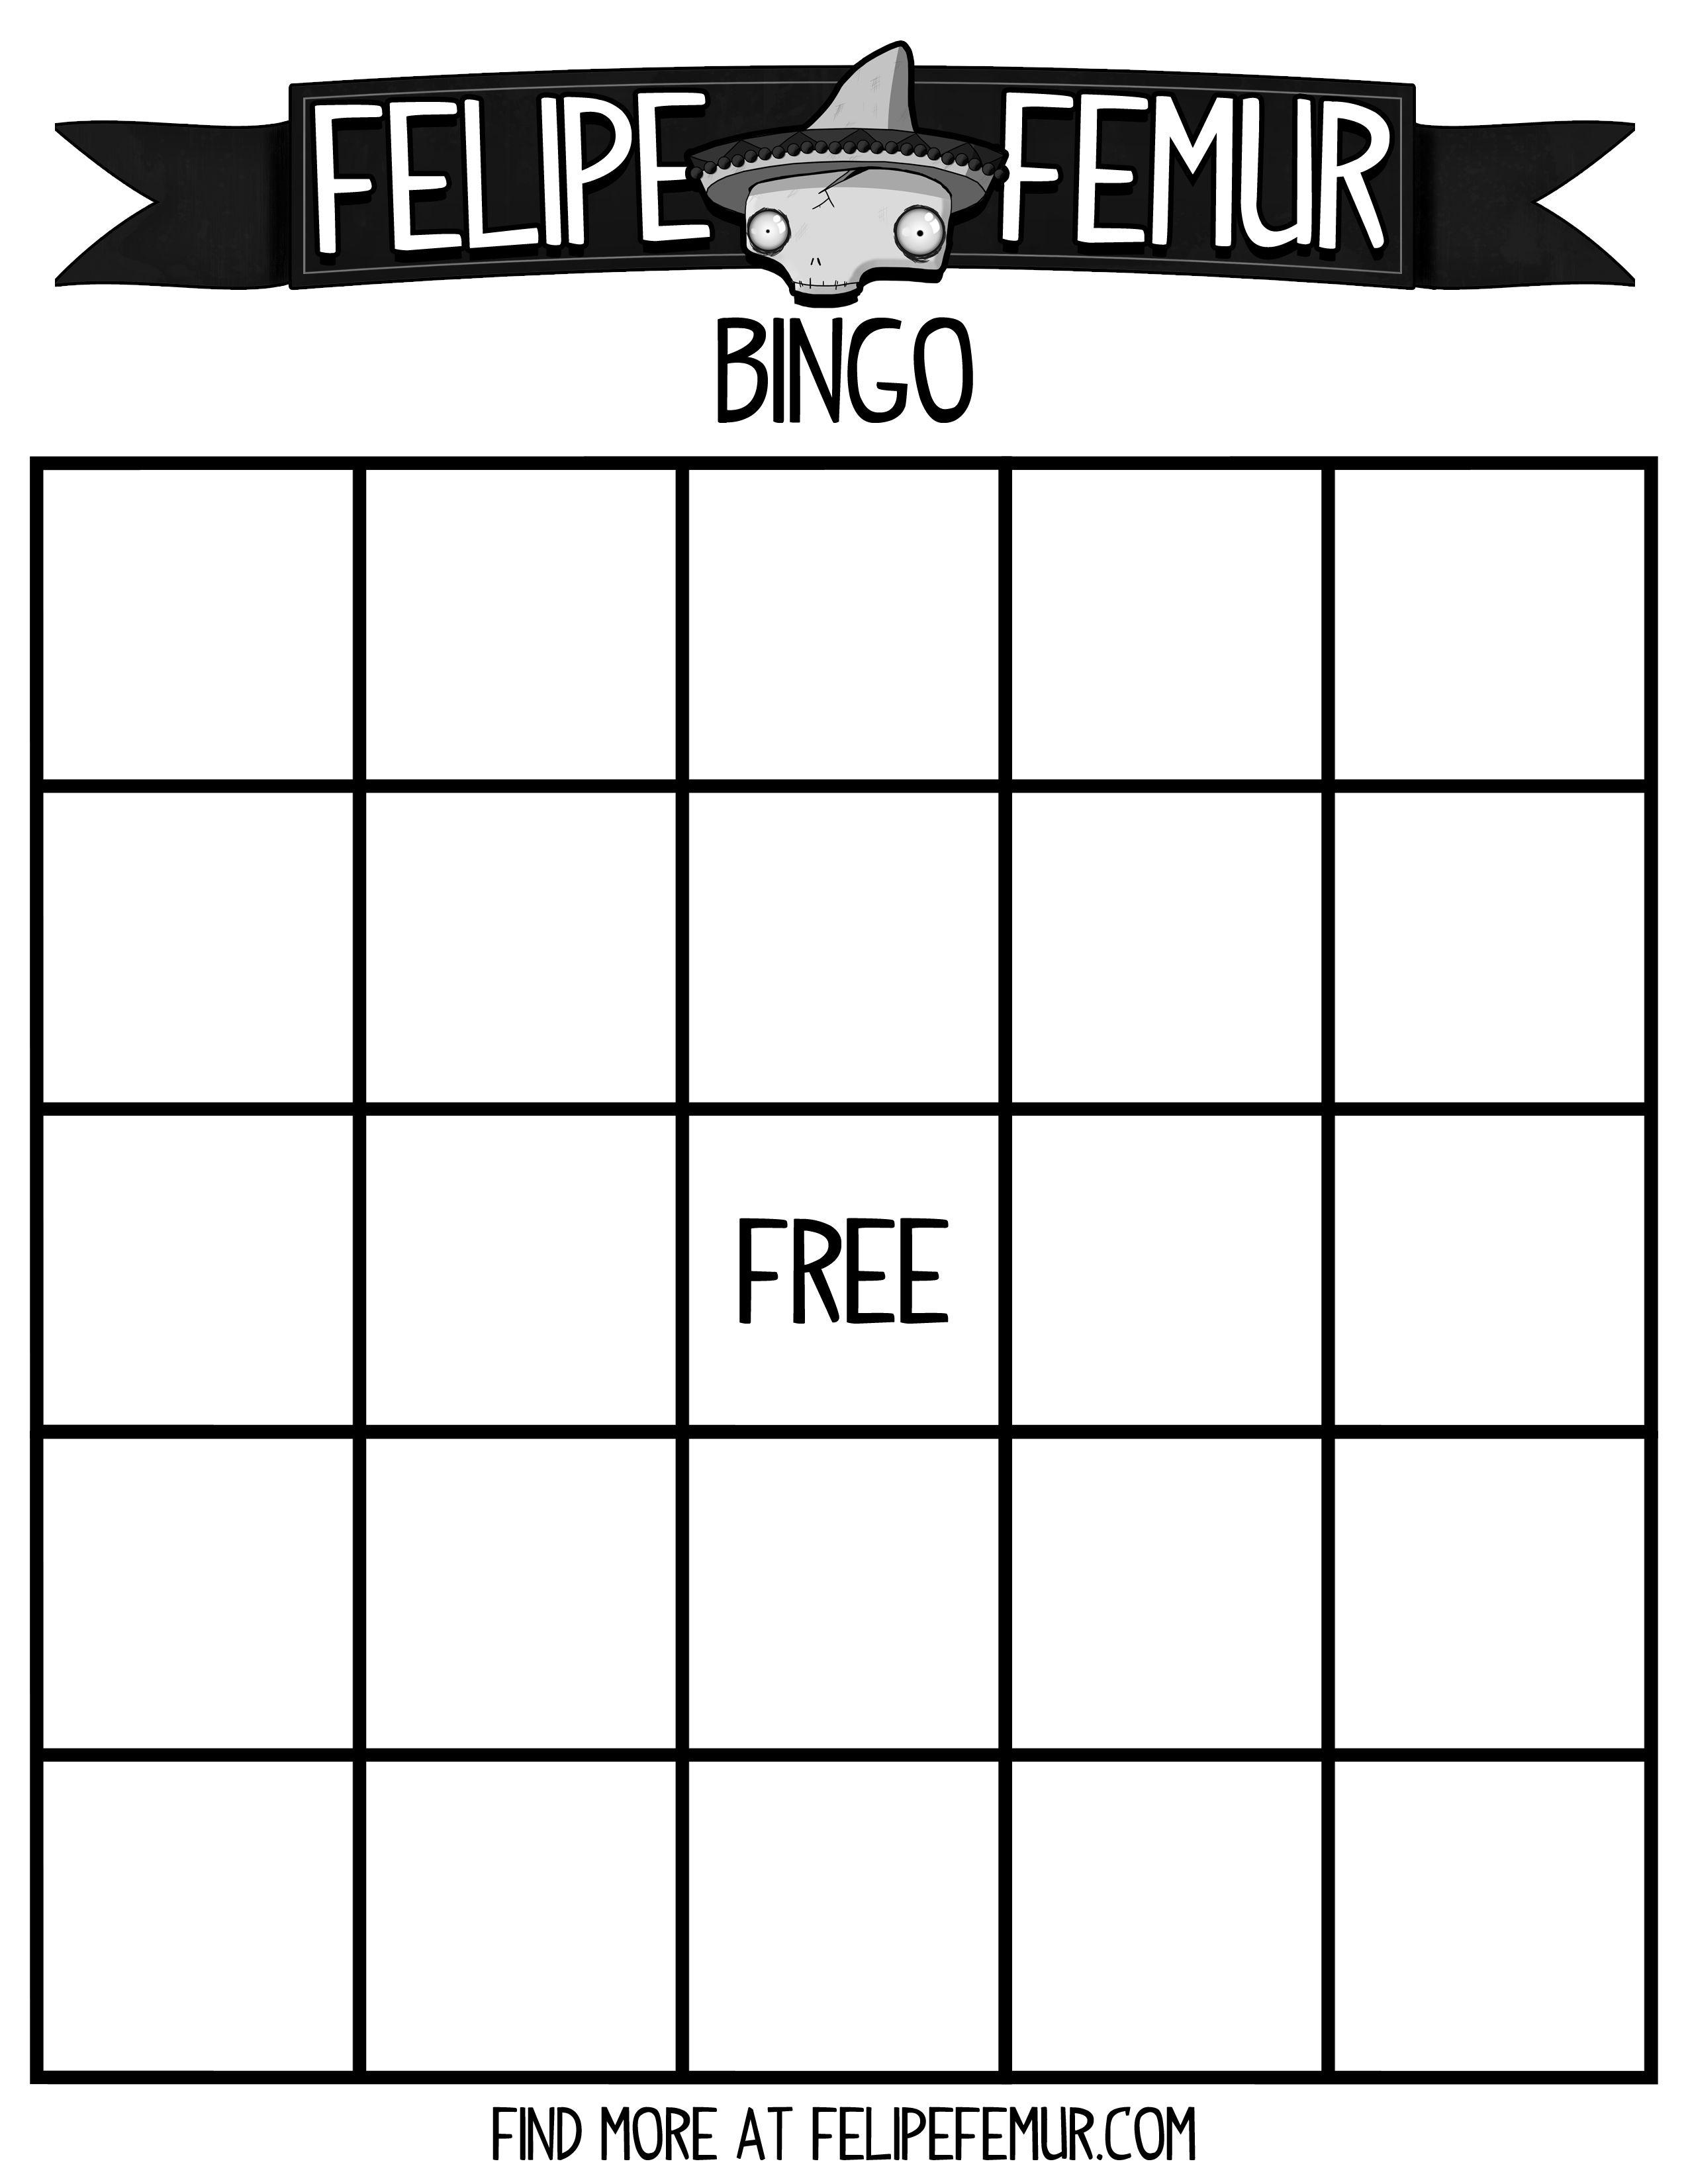 Free Bingo Cards Free Bingo Card Free Bingo Template